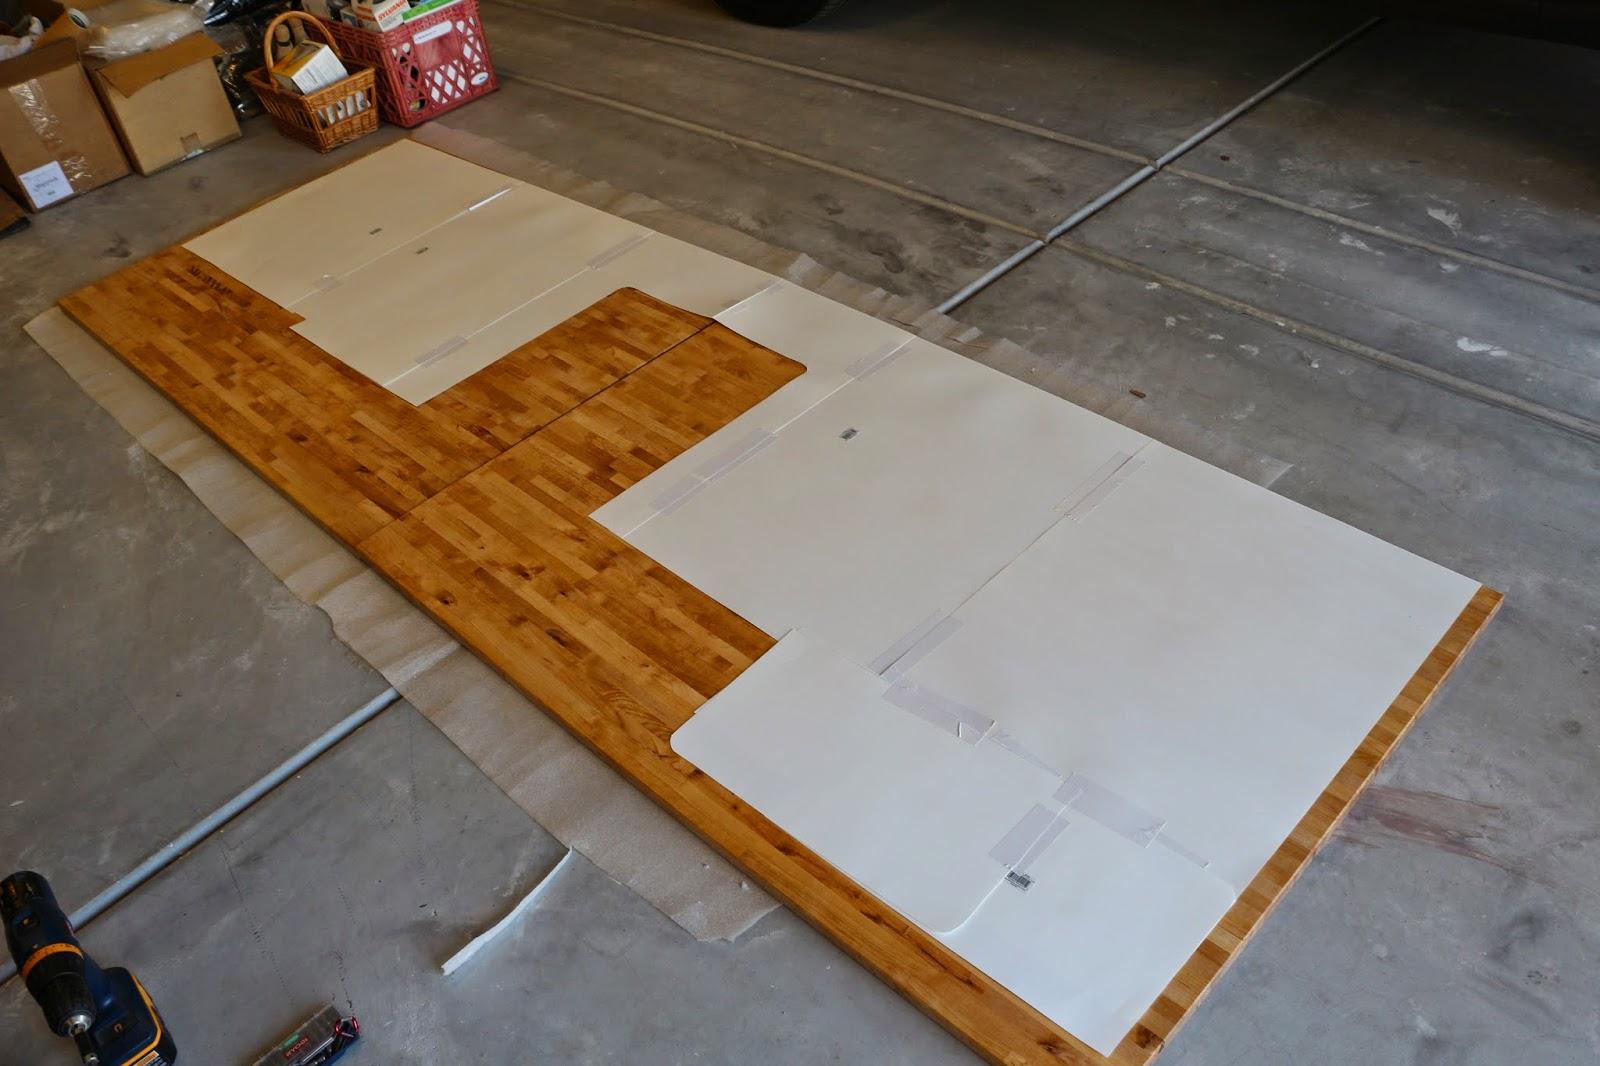 diy wood counters, wood countertop template, how to make wood countertops